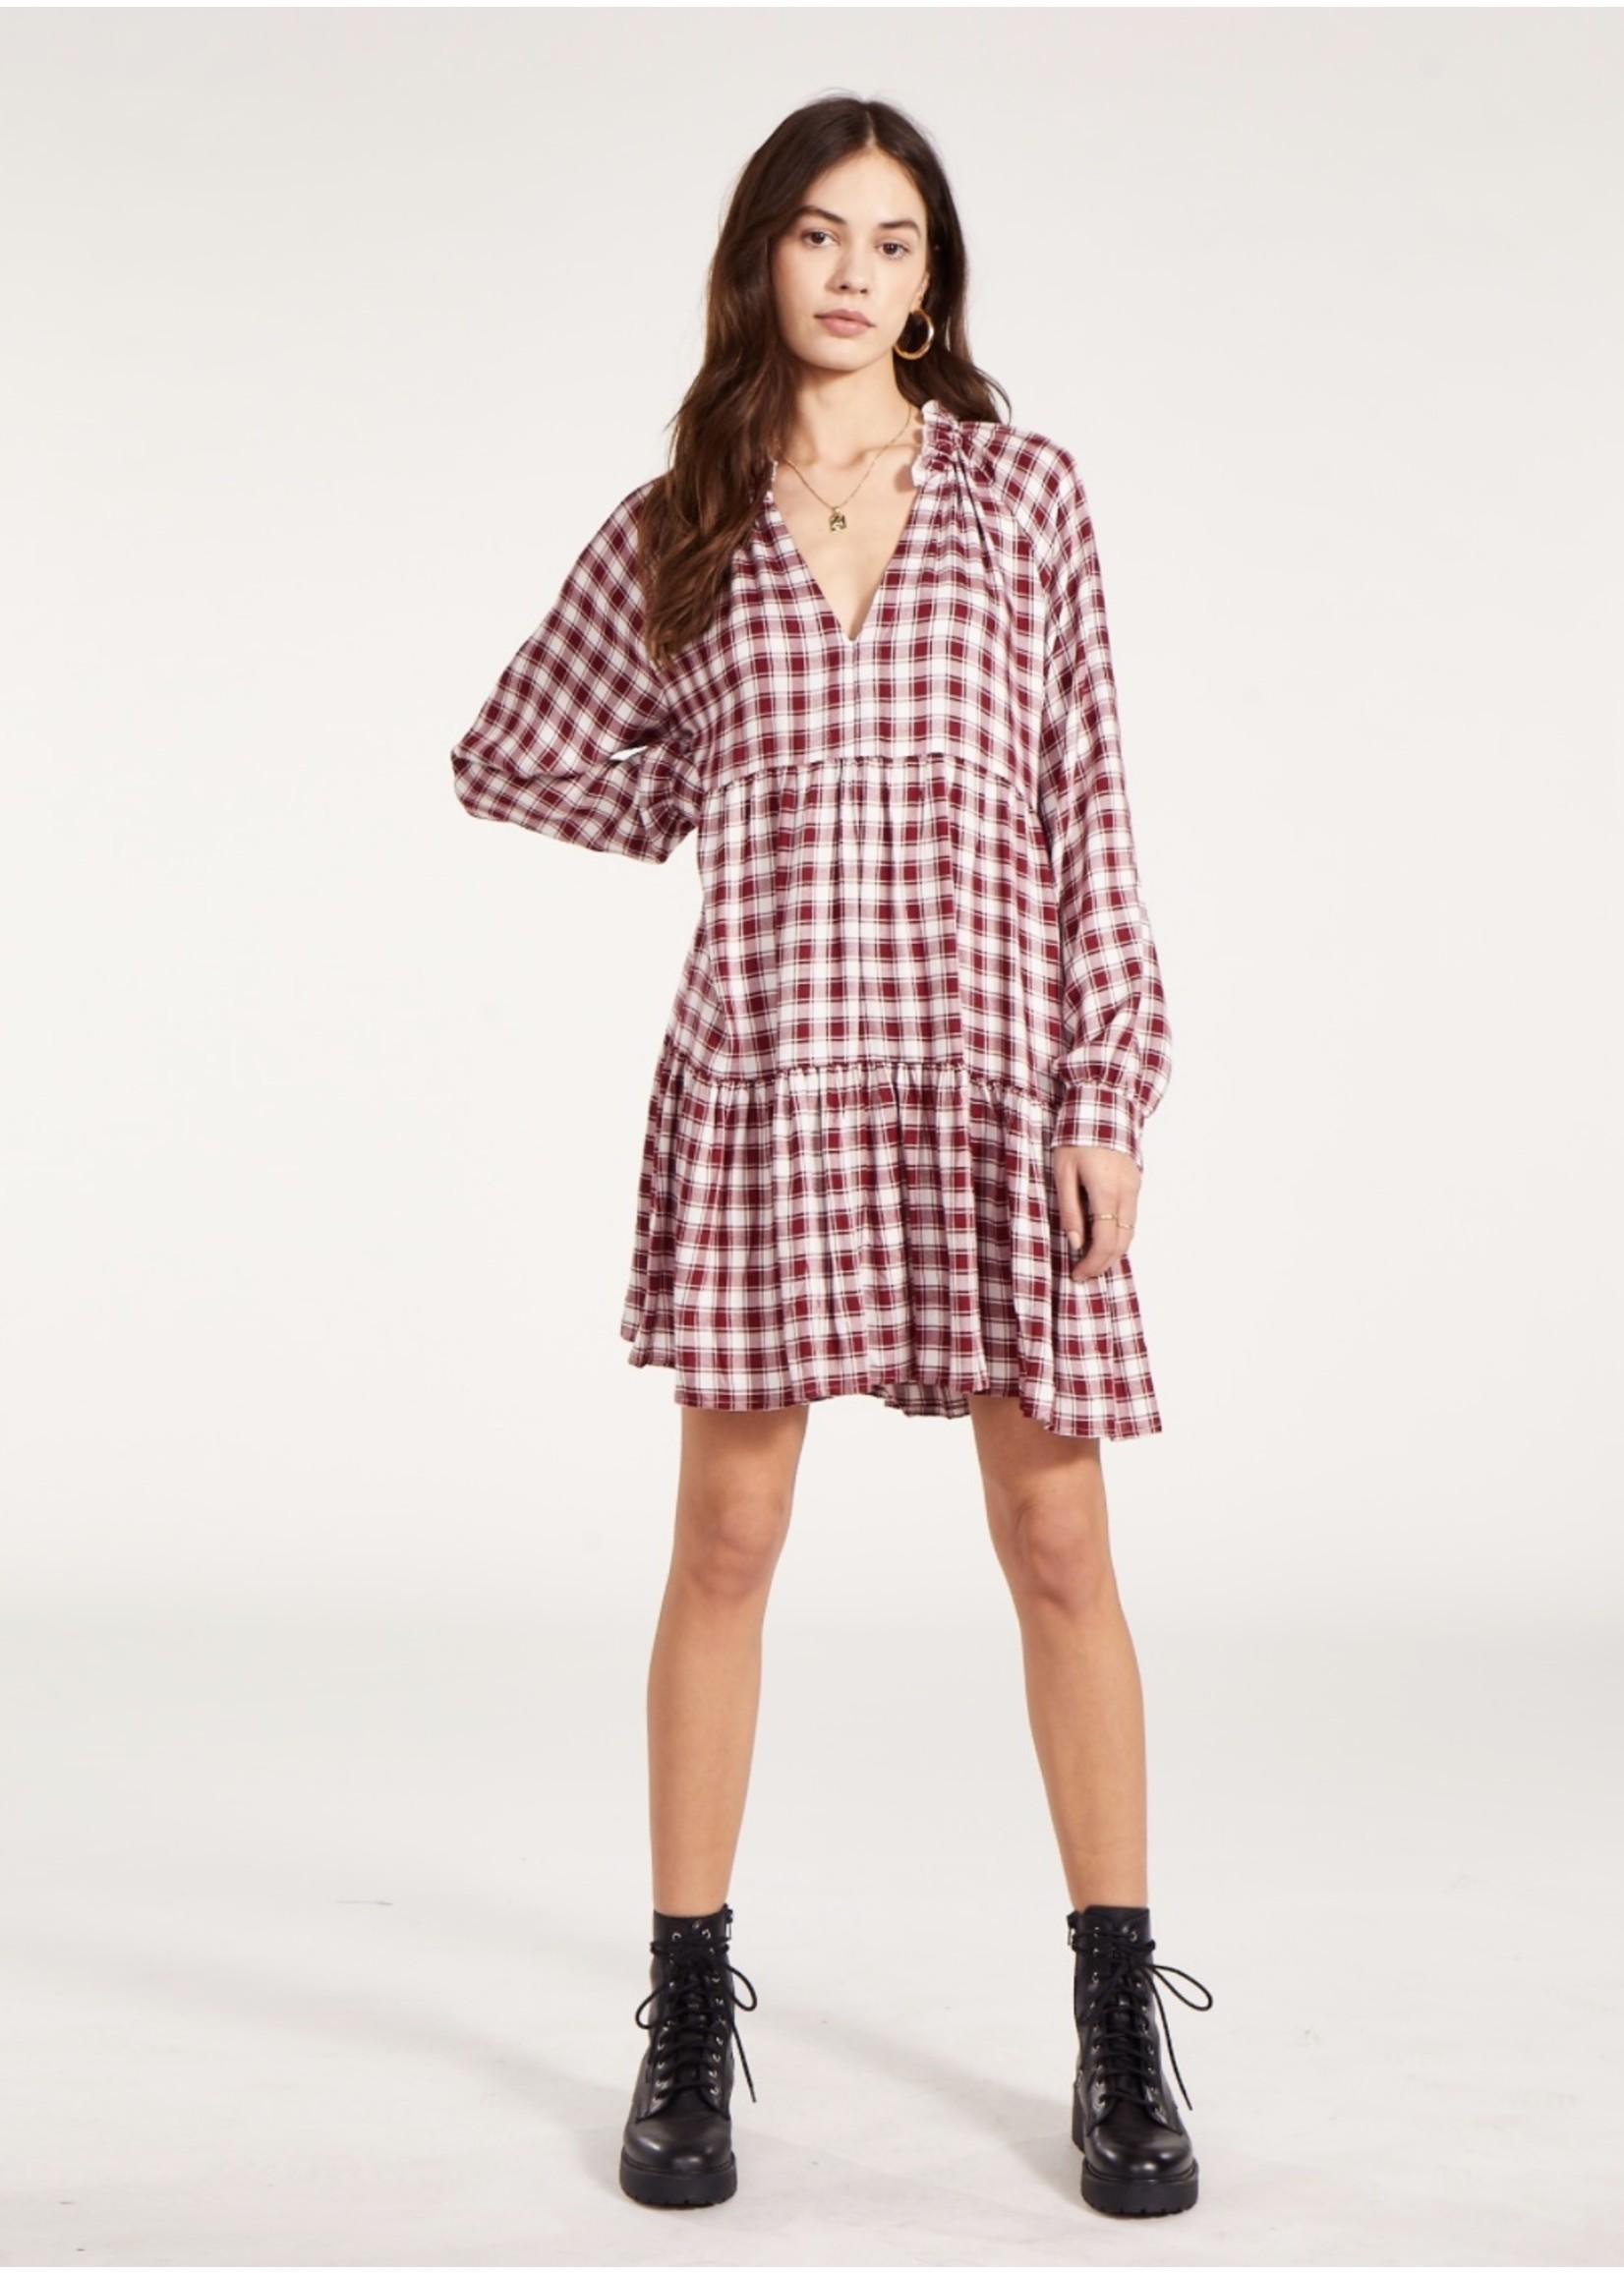 BB Dakota Plaid To Be You Dress - BL308243